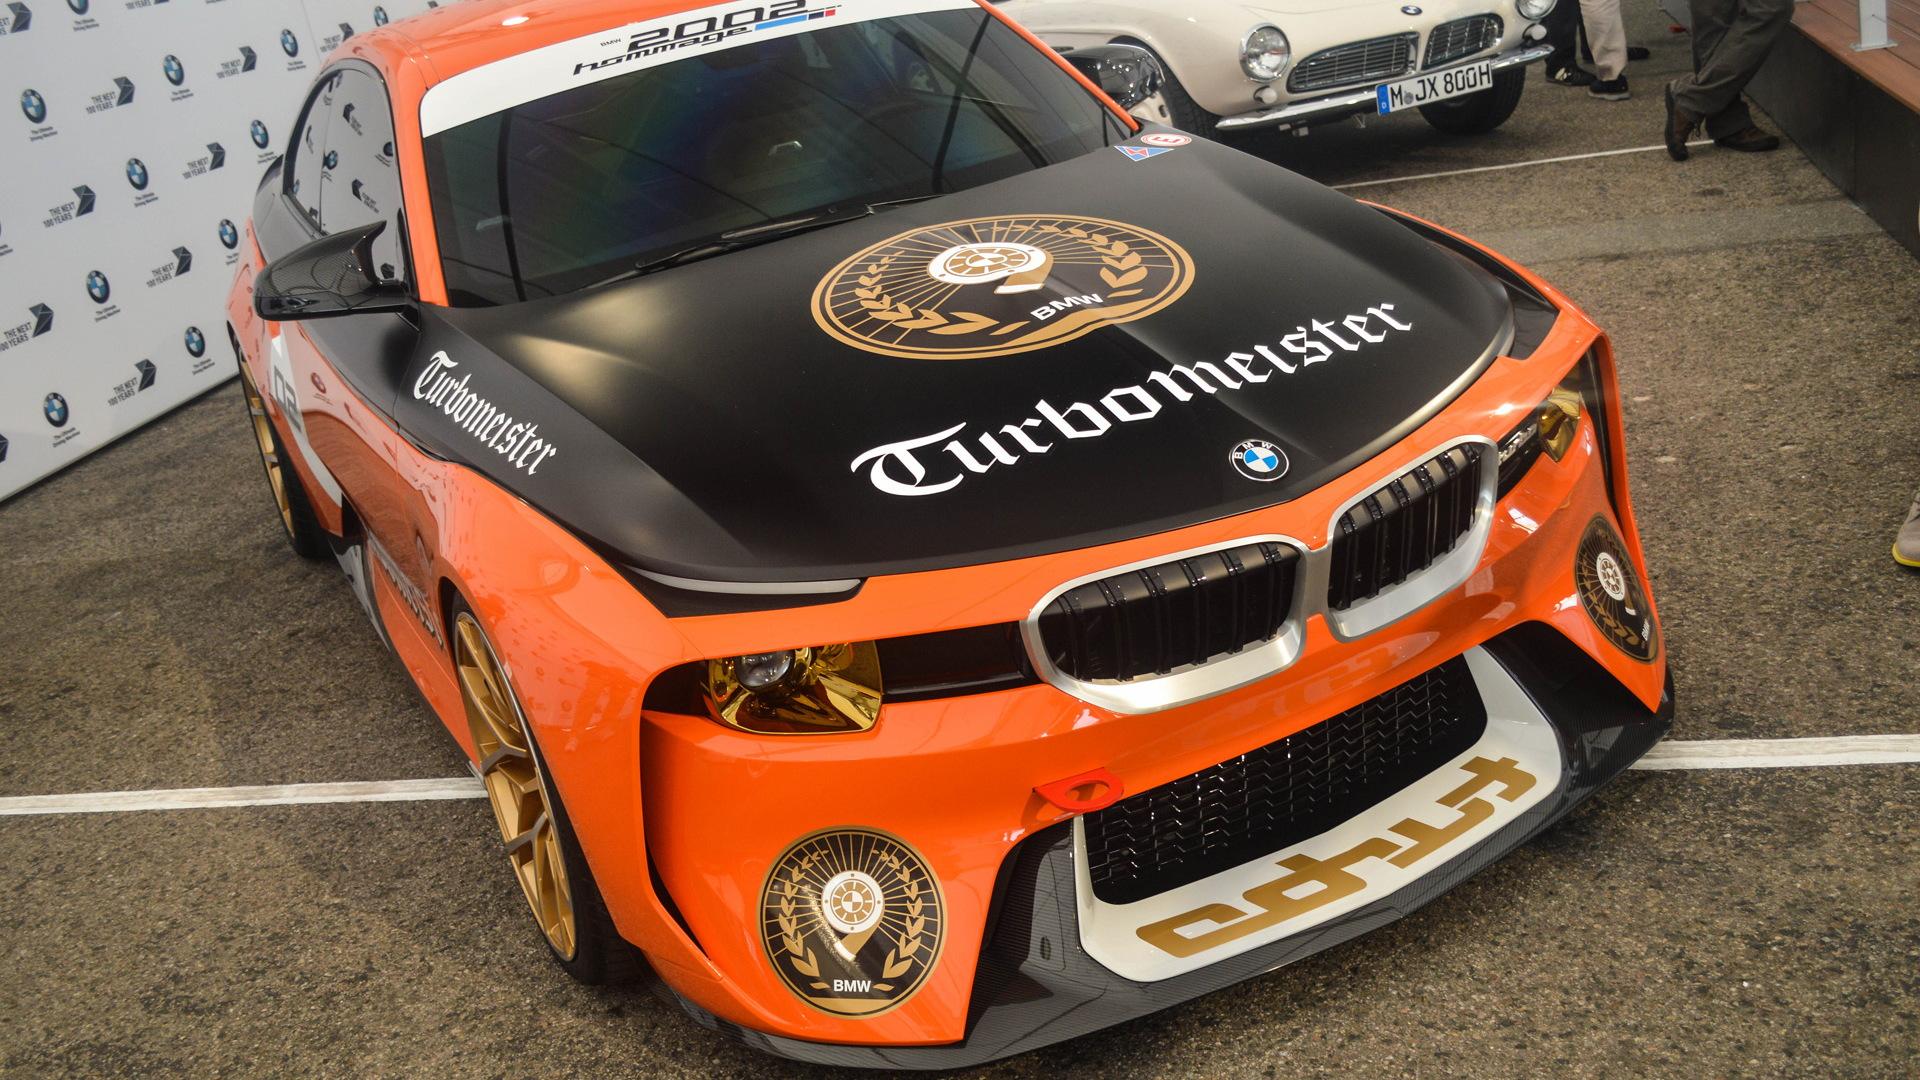 BMW 2002 Hommage concept, 2016 Monterey Car Week - Image via Carspotter Jeroen